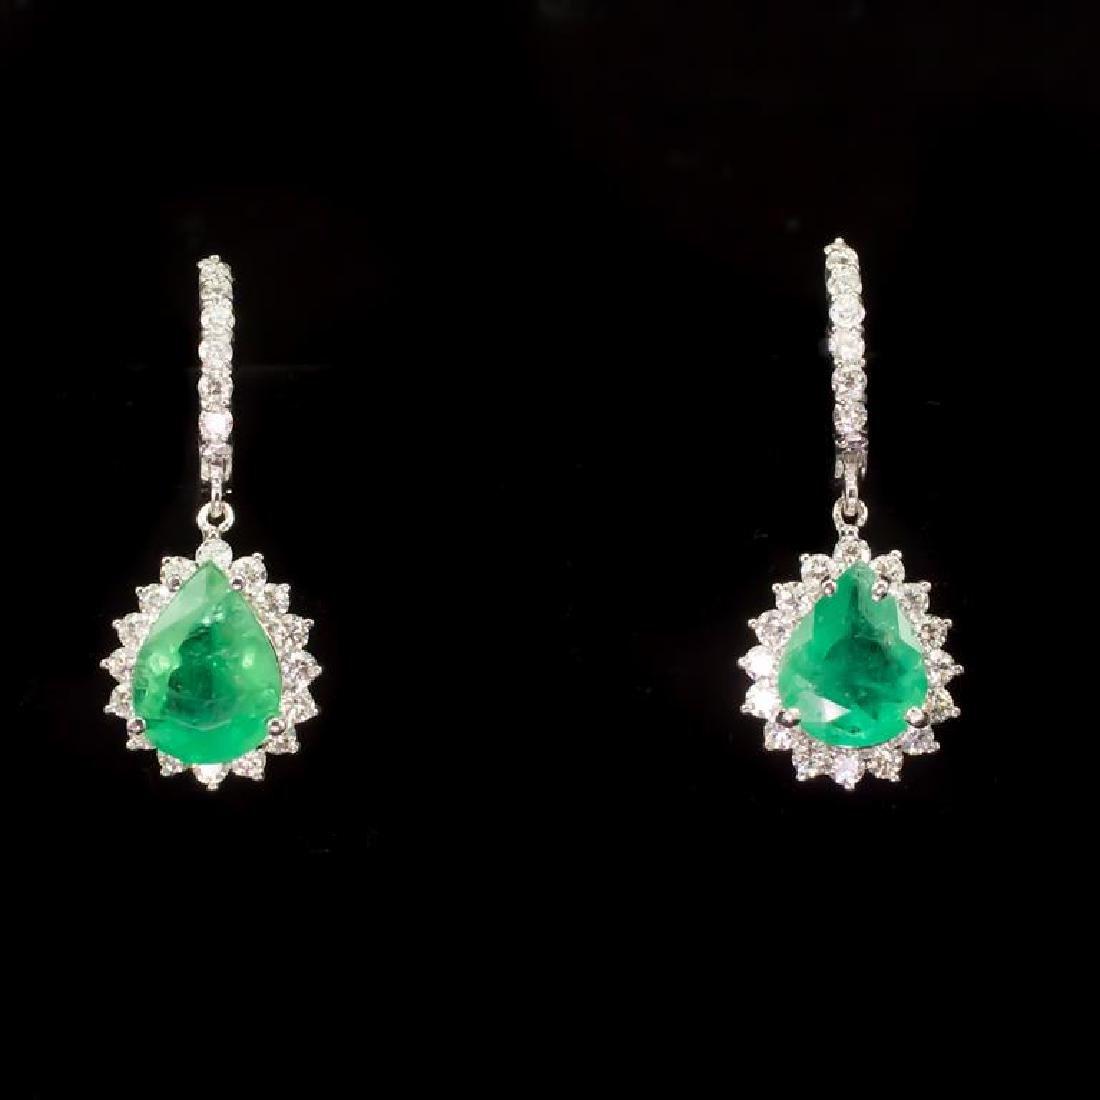 14K Gold 4.86ct Emerald 1.79ct Diamond Earrings